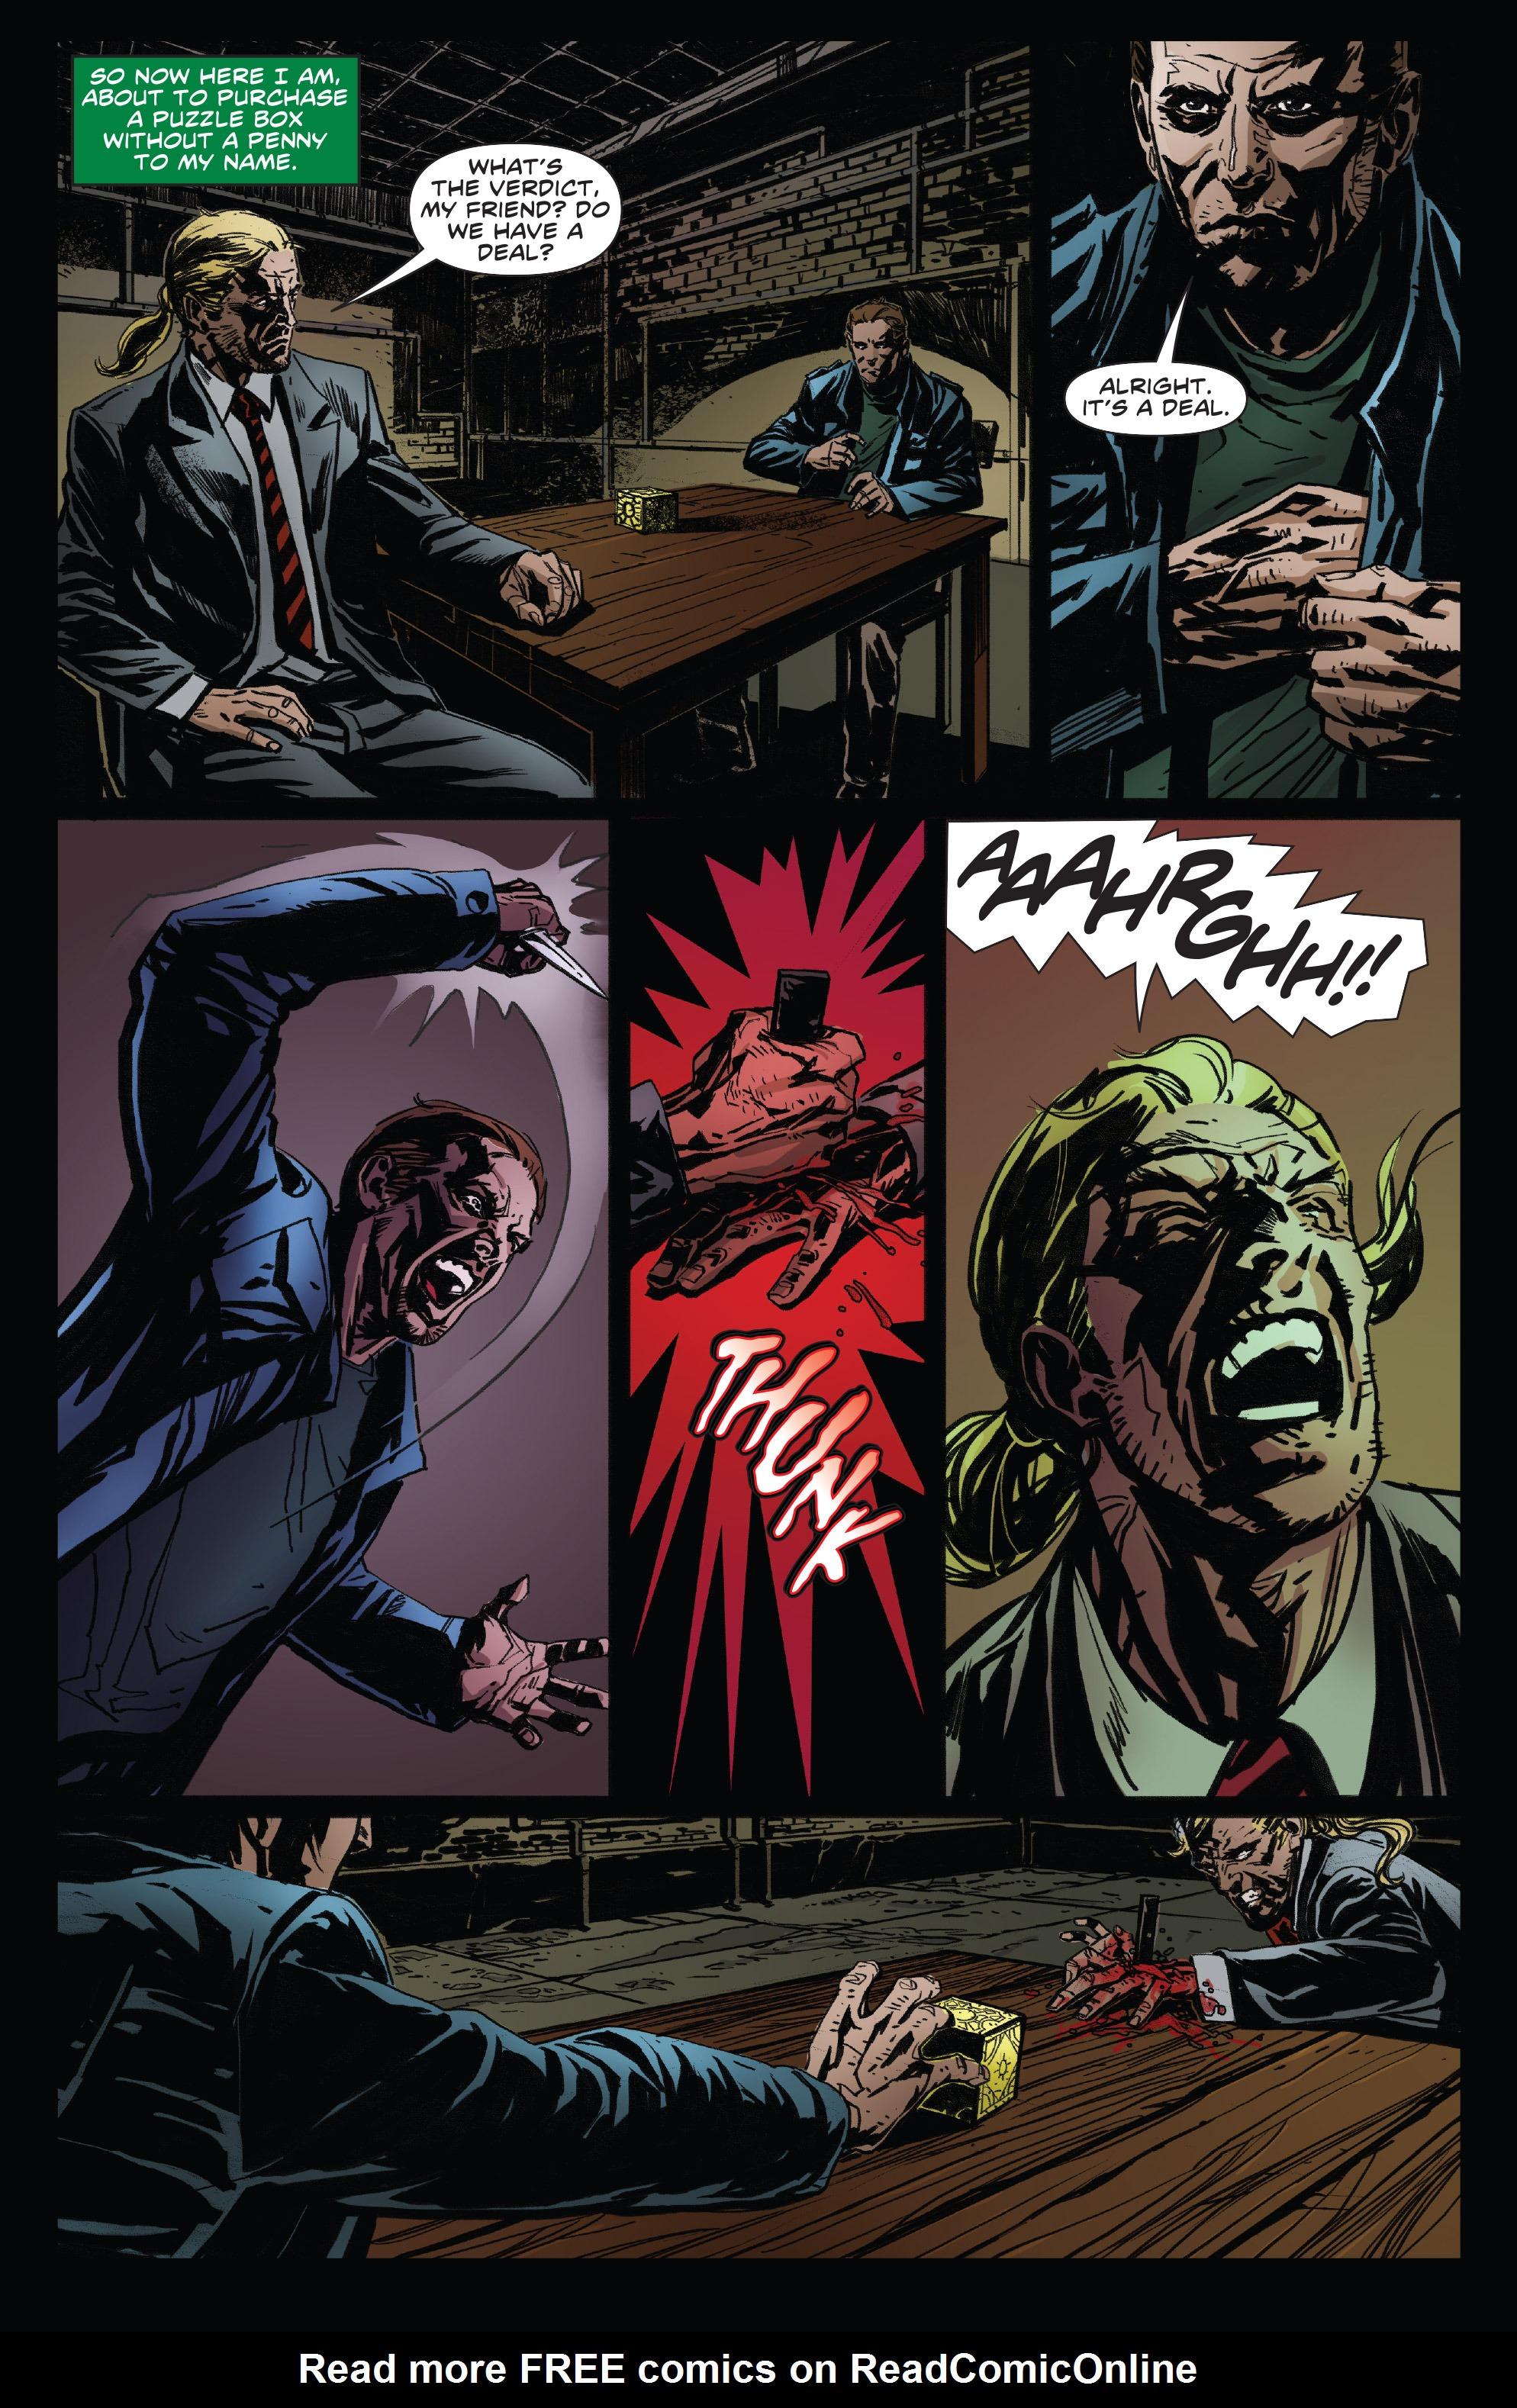 Read online Clive Barker's Hellraiser: The Dark Watch comic -  Issue # TPB 3 - 18